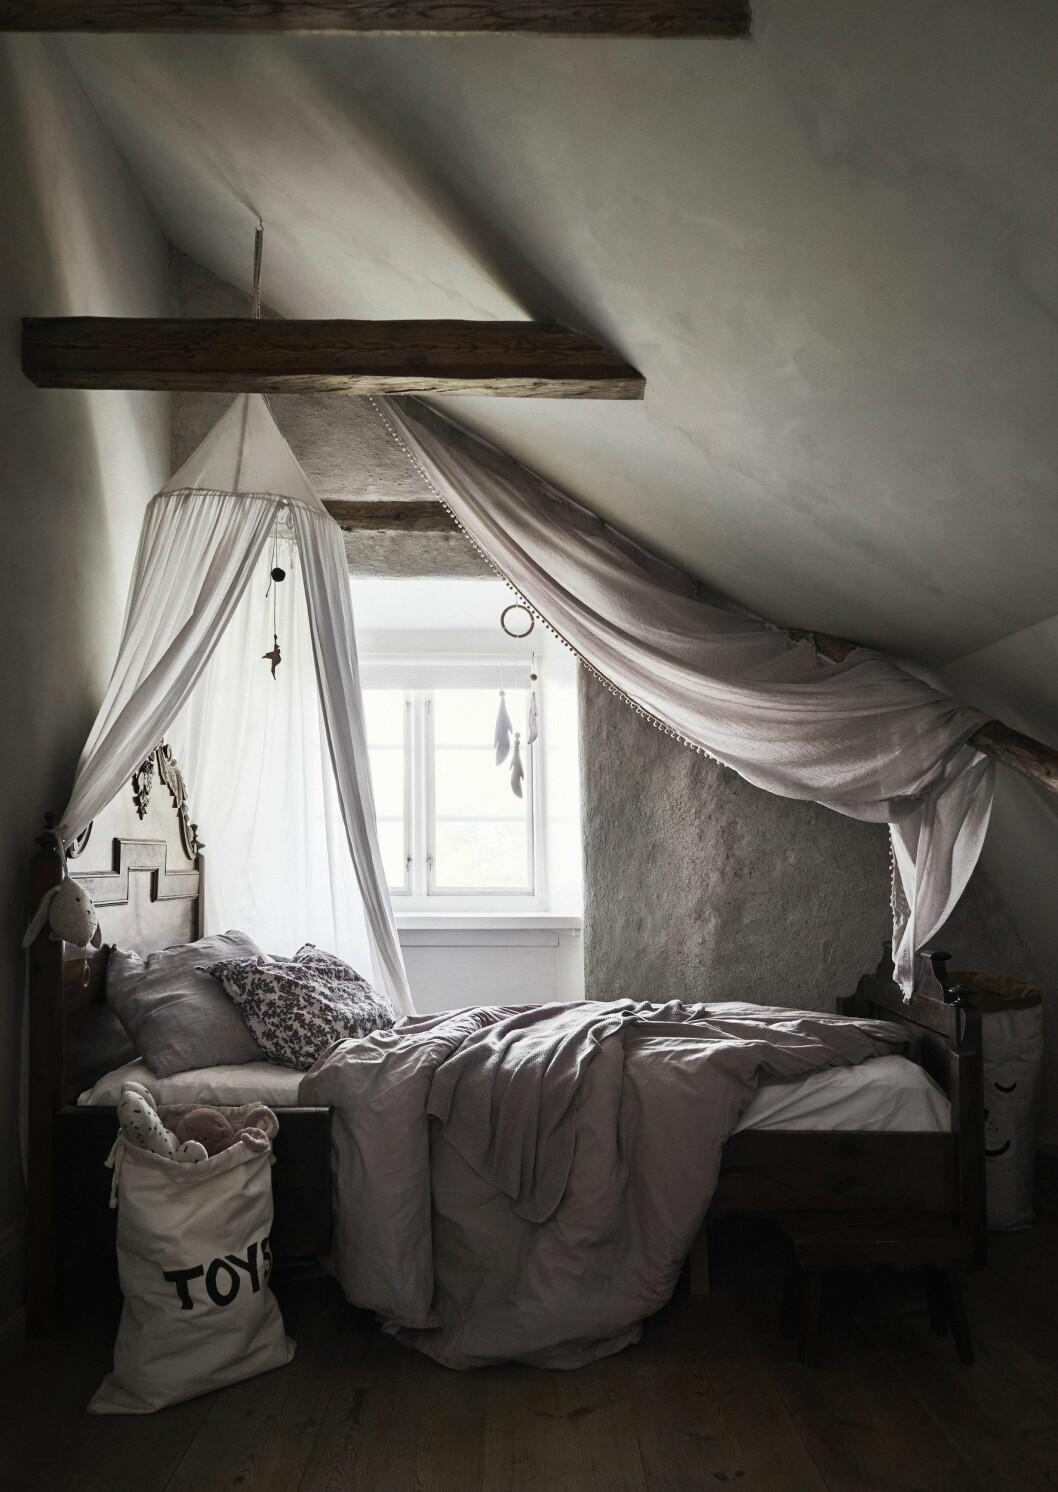 Sovrum med träbalkar i taket.